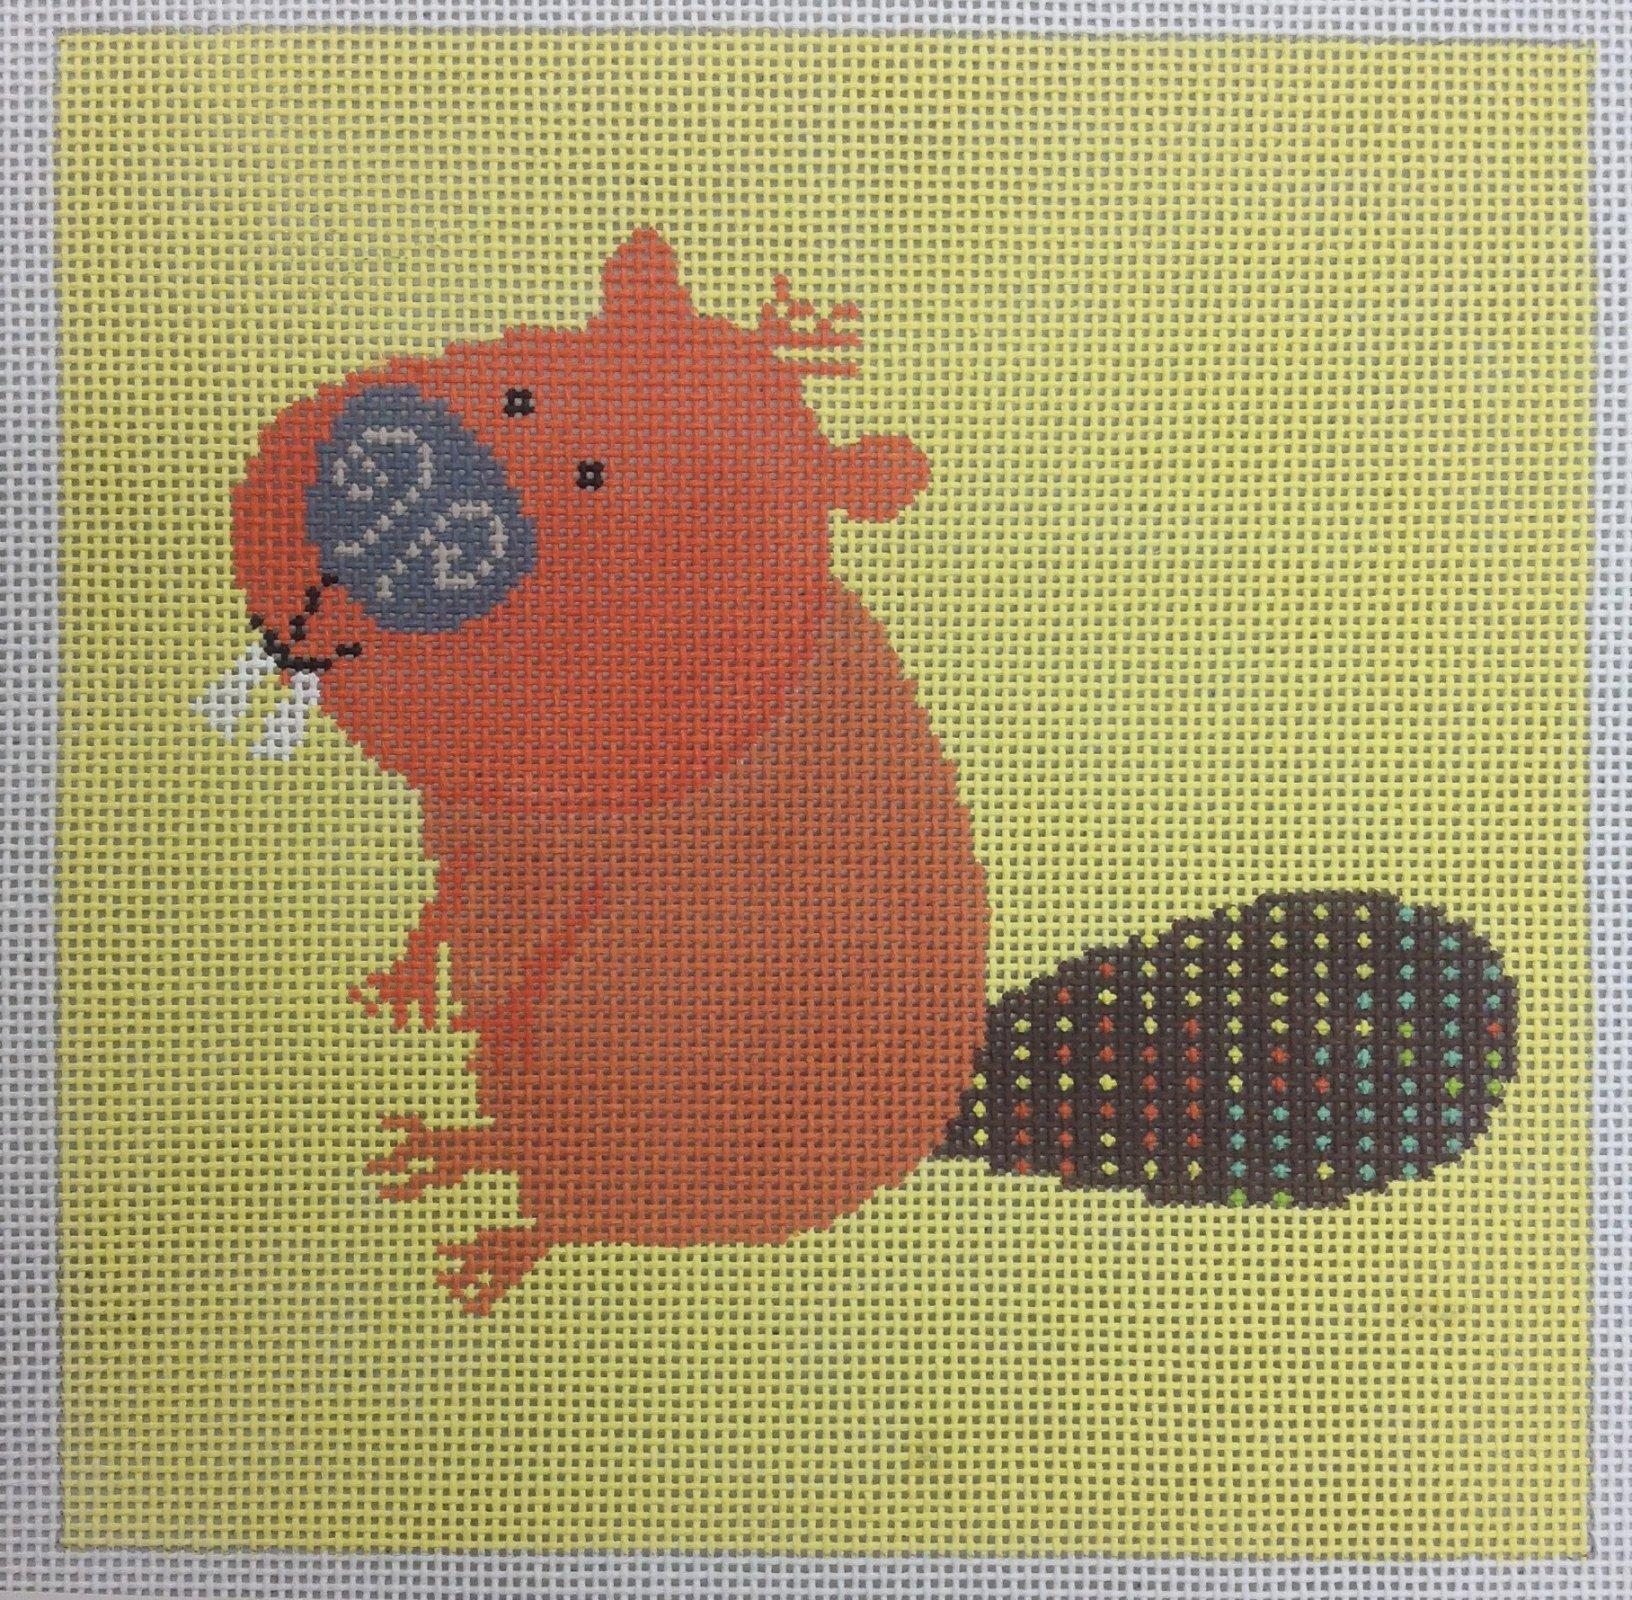 bucky beaver*